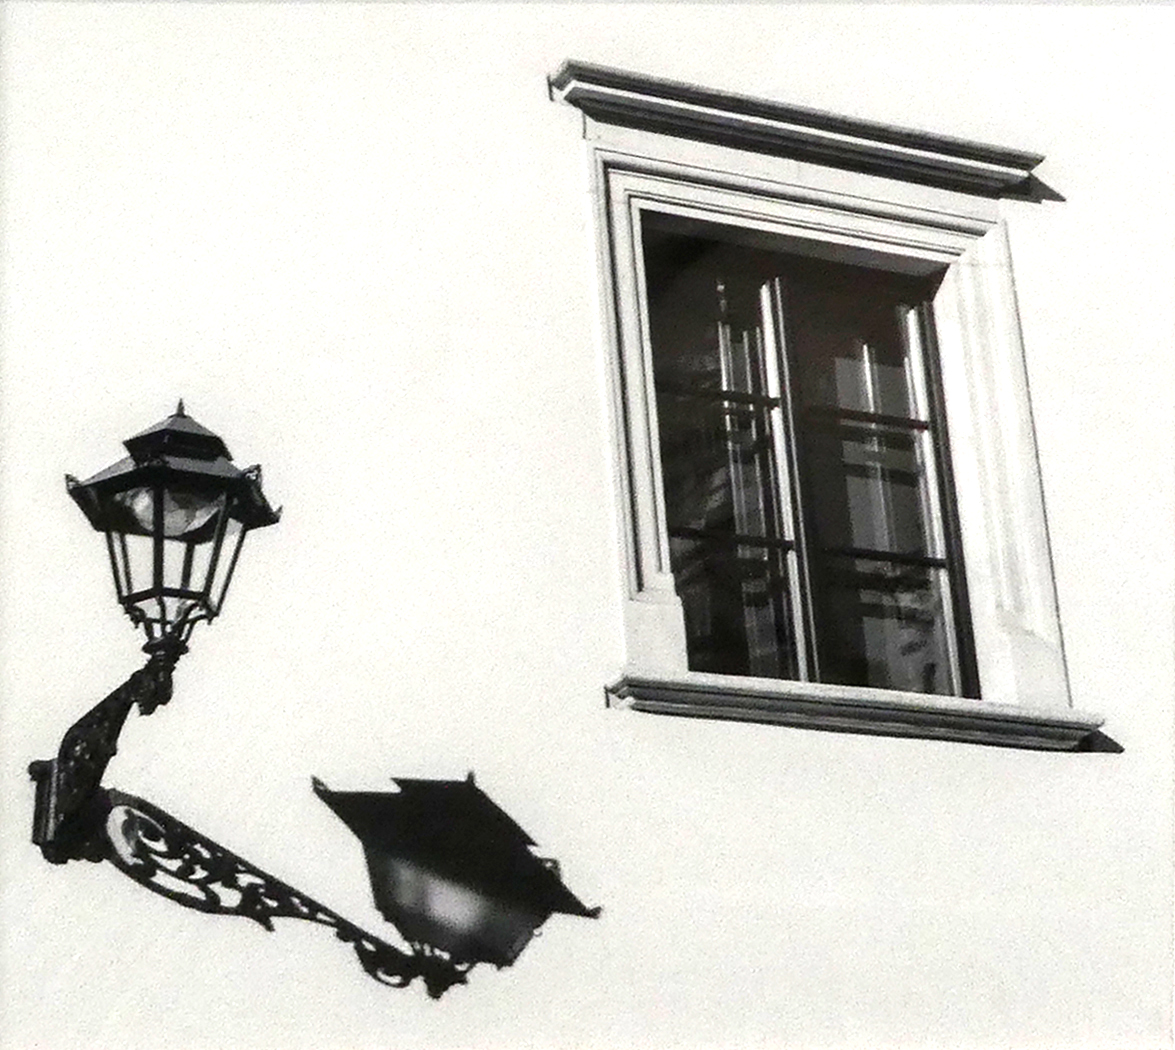 'Lamp & Window' by Paul Rigg